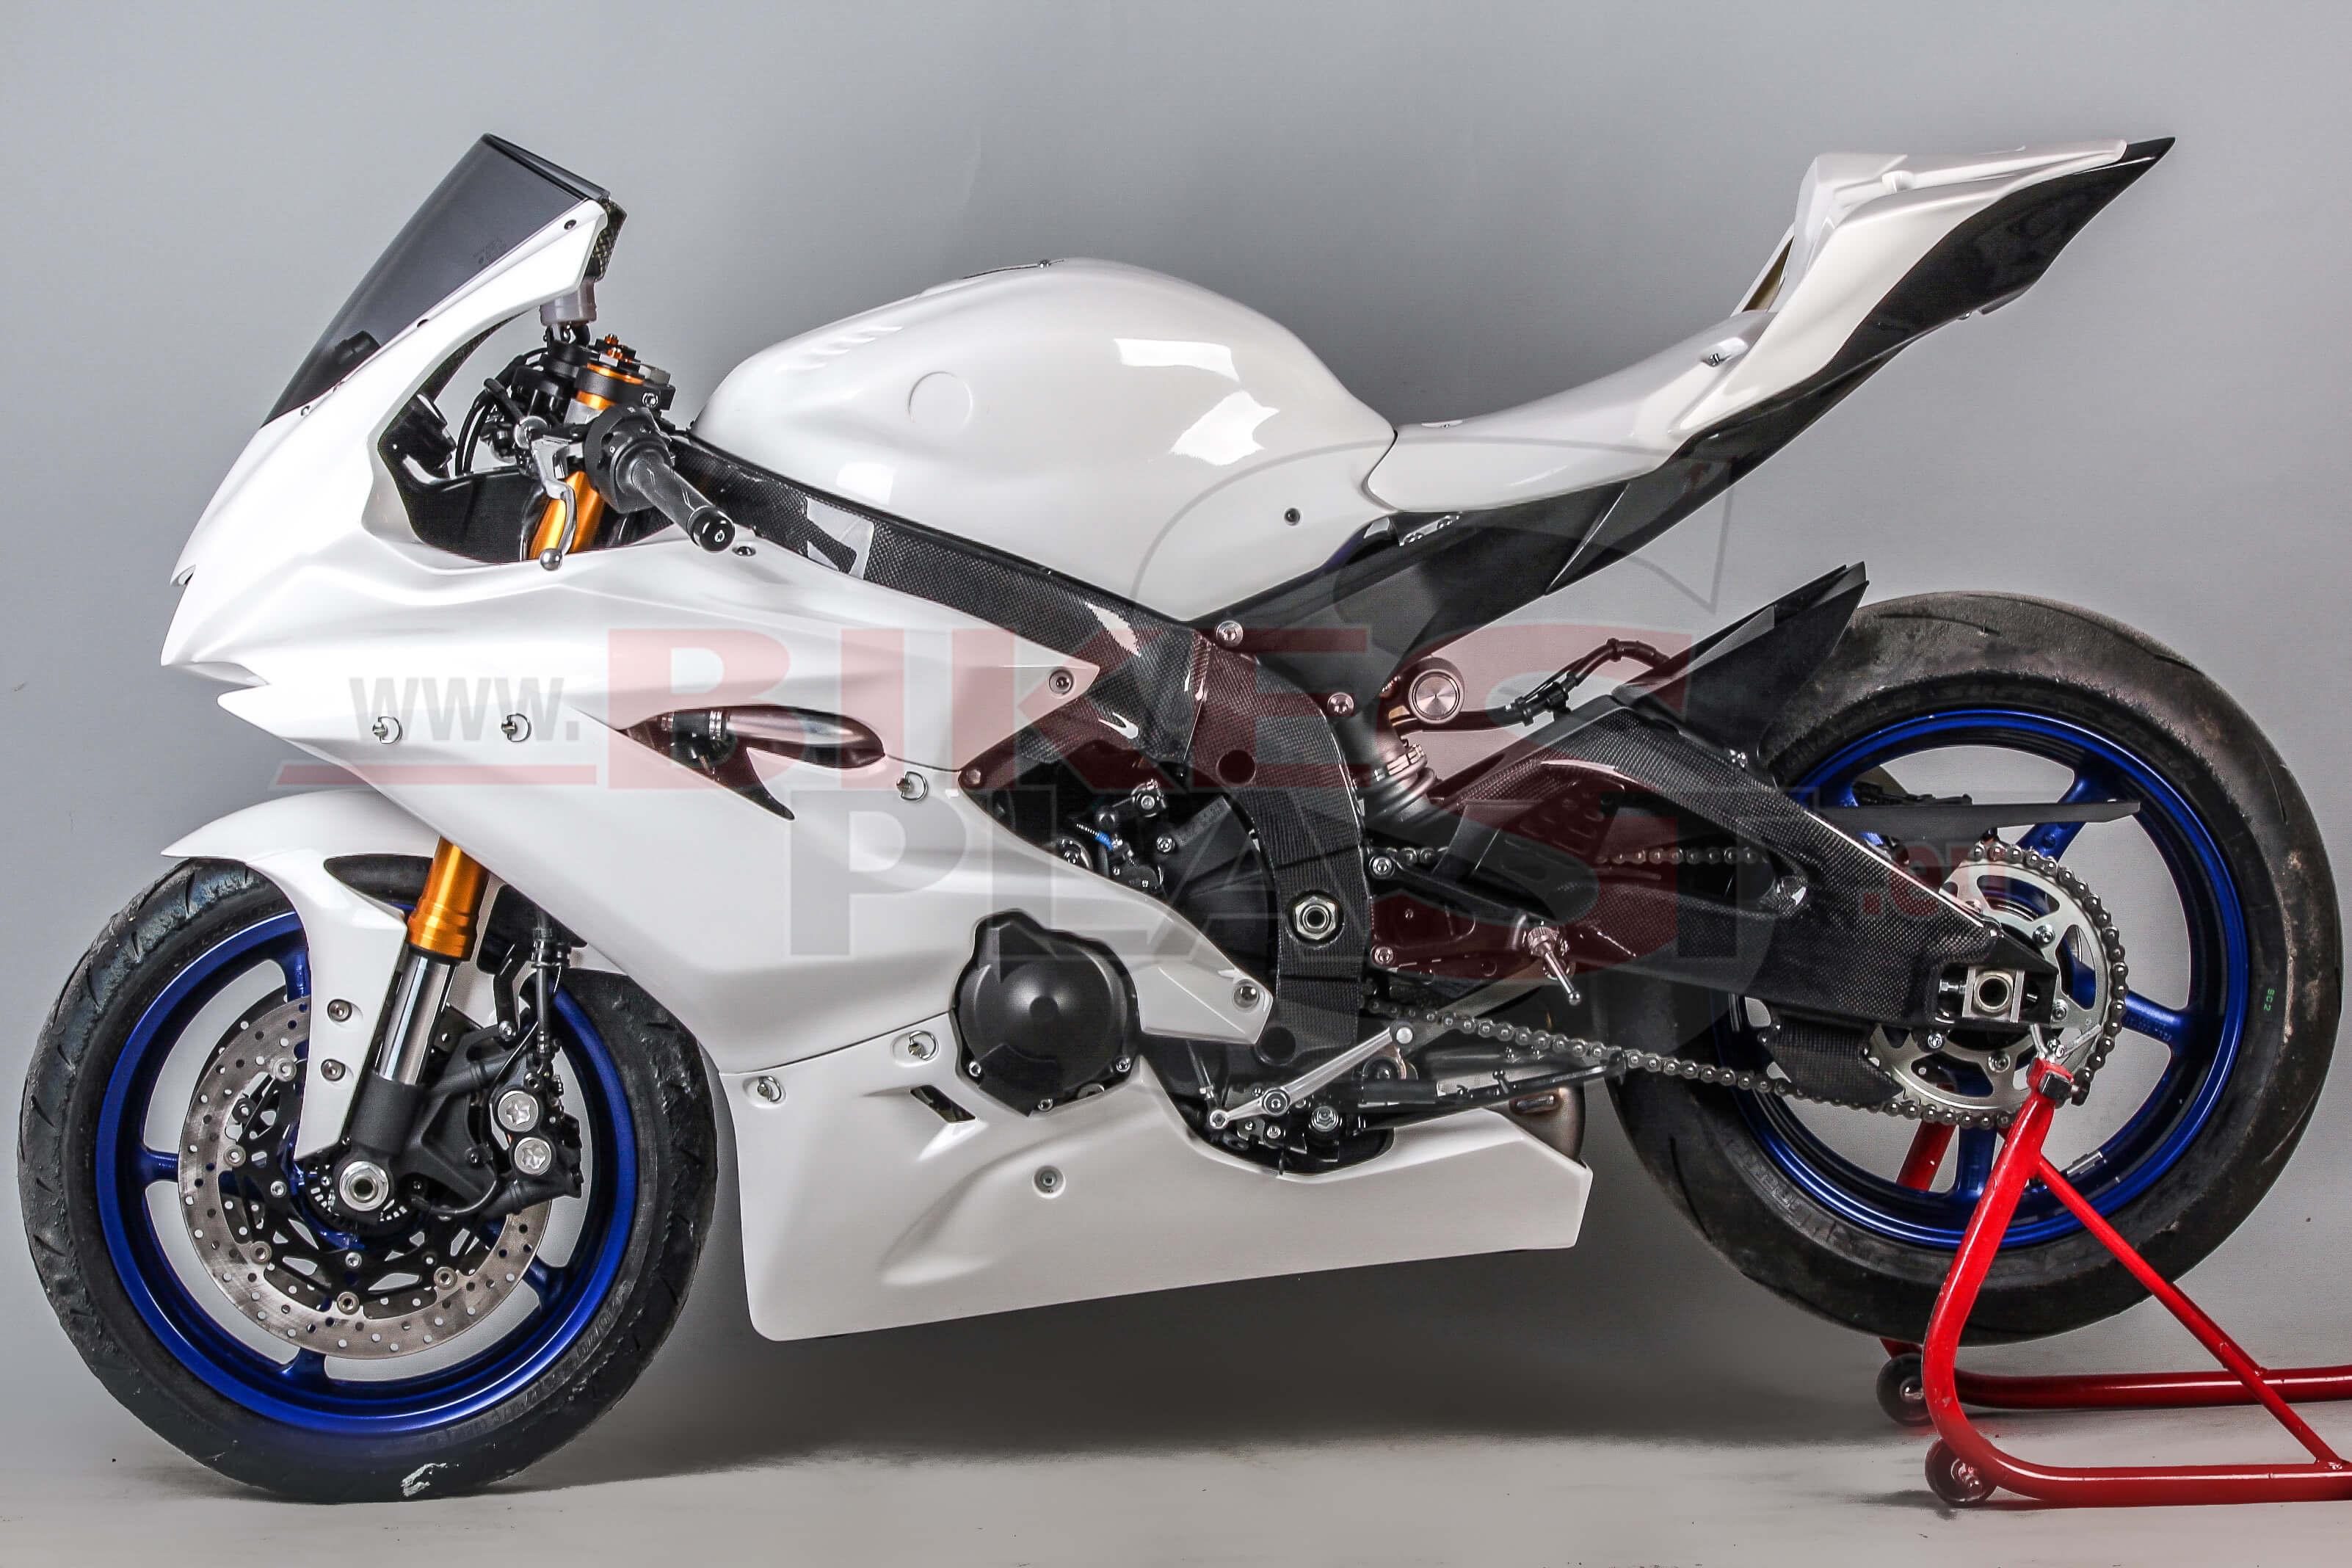 Special Upgrade Kit Yamaha R6 2006 2016 To 2017